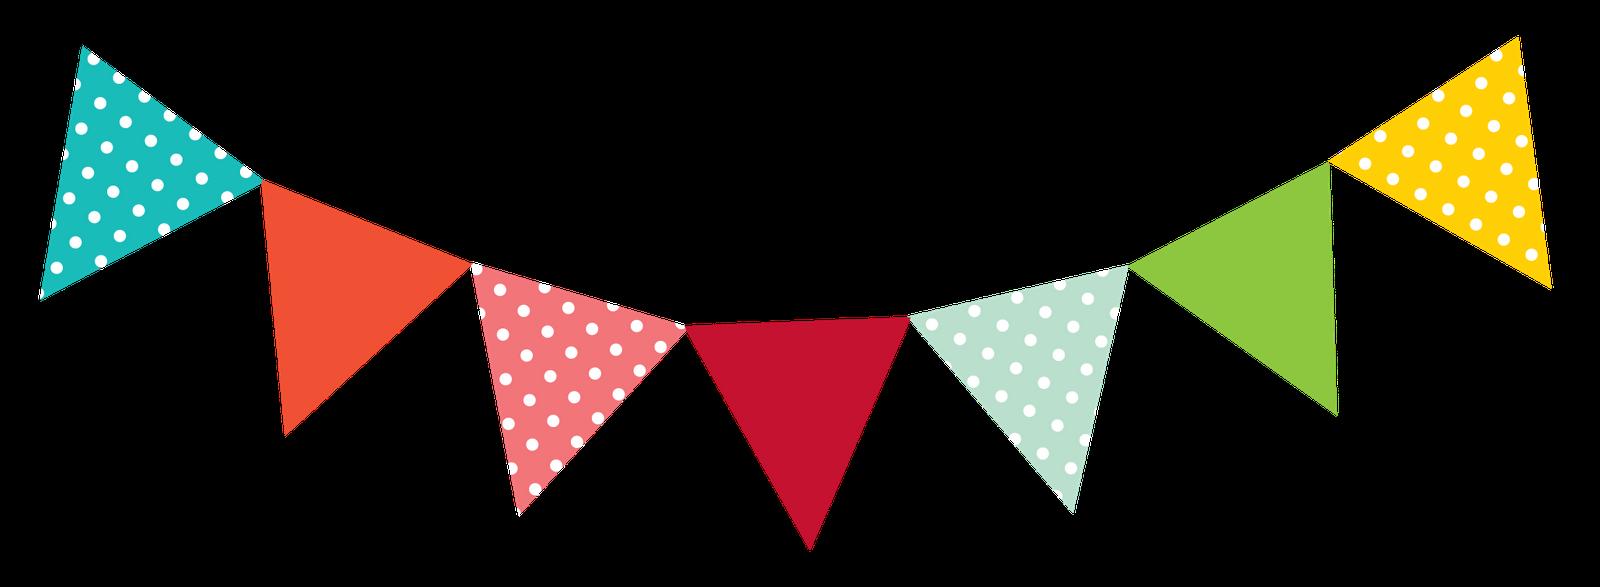 1600x587 Carnival Clipart Flag Banner